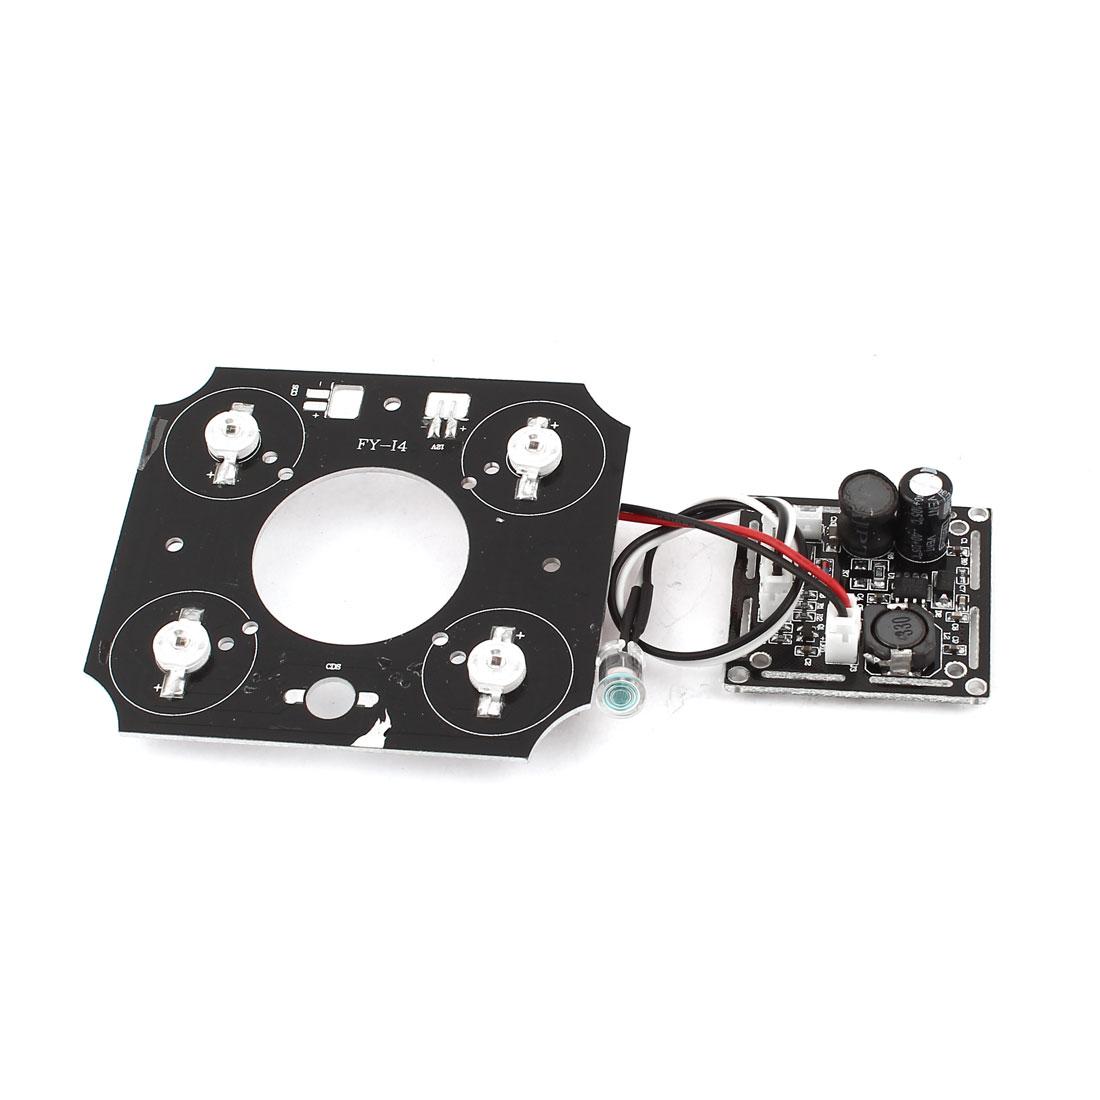 42mil 4 Array LEDs IR Illuminator Bulb Lamp Board Plate for CCTV Security Camera